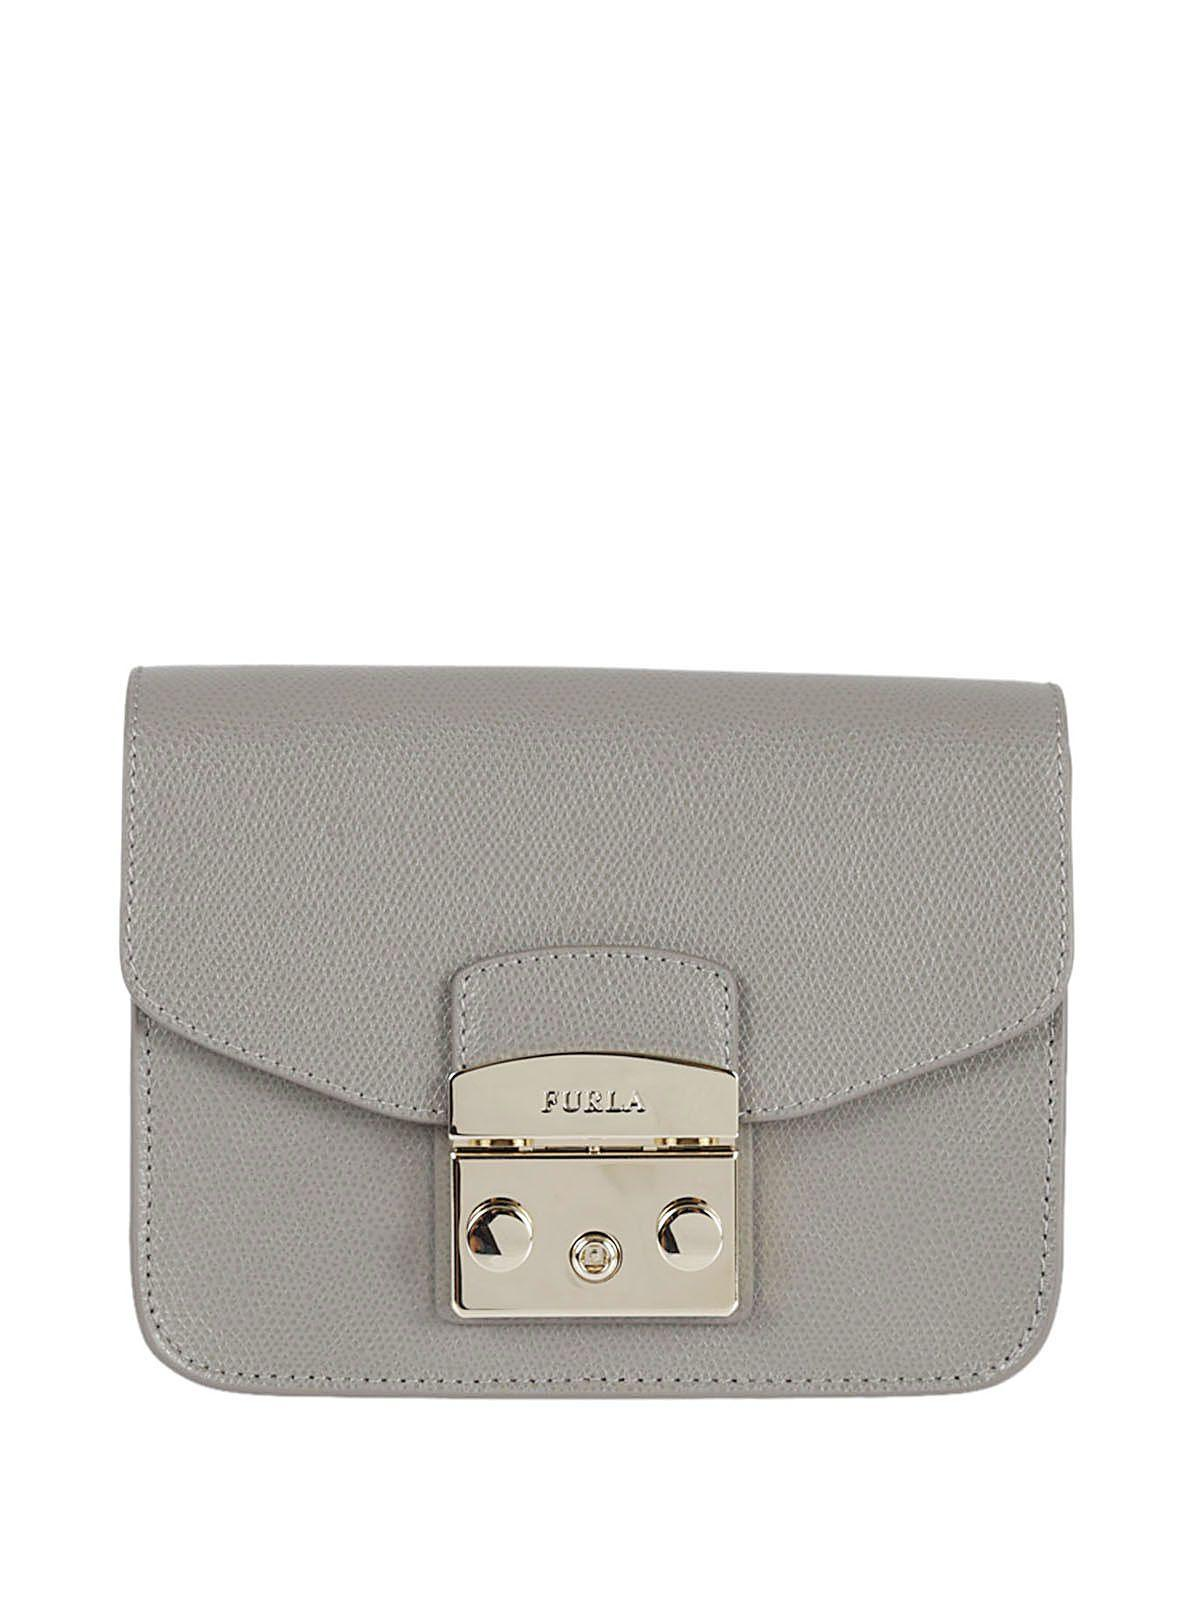 Furla Metropolis Mini Shoulder Bag In Argilla